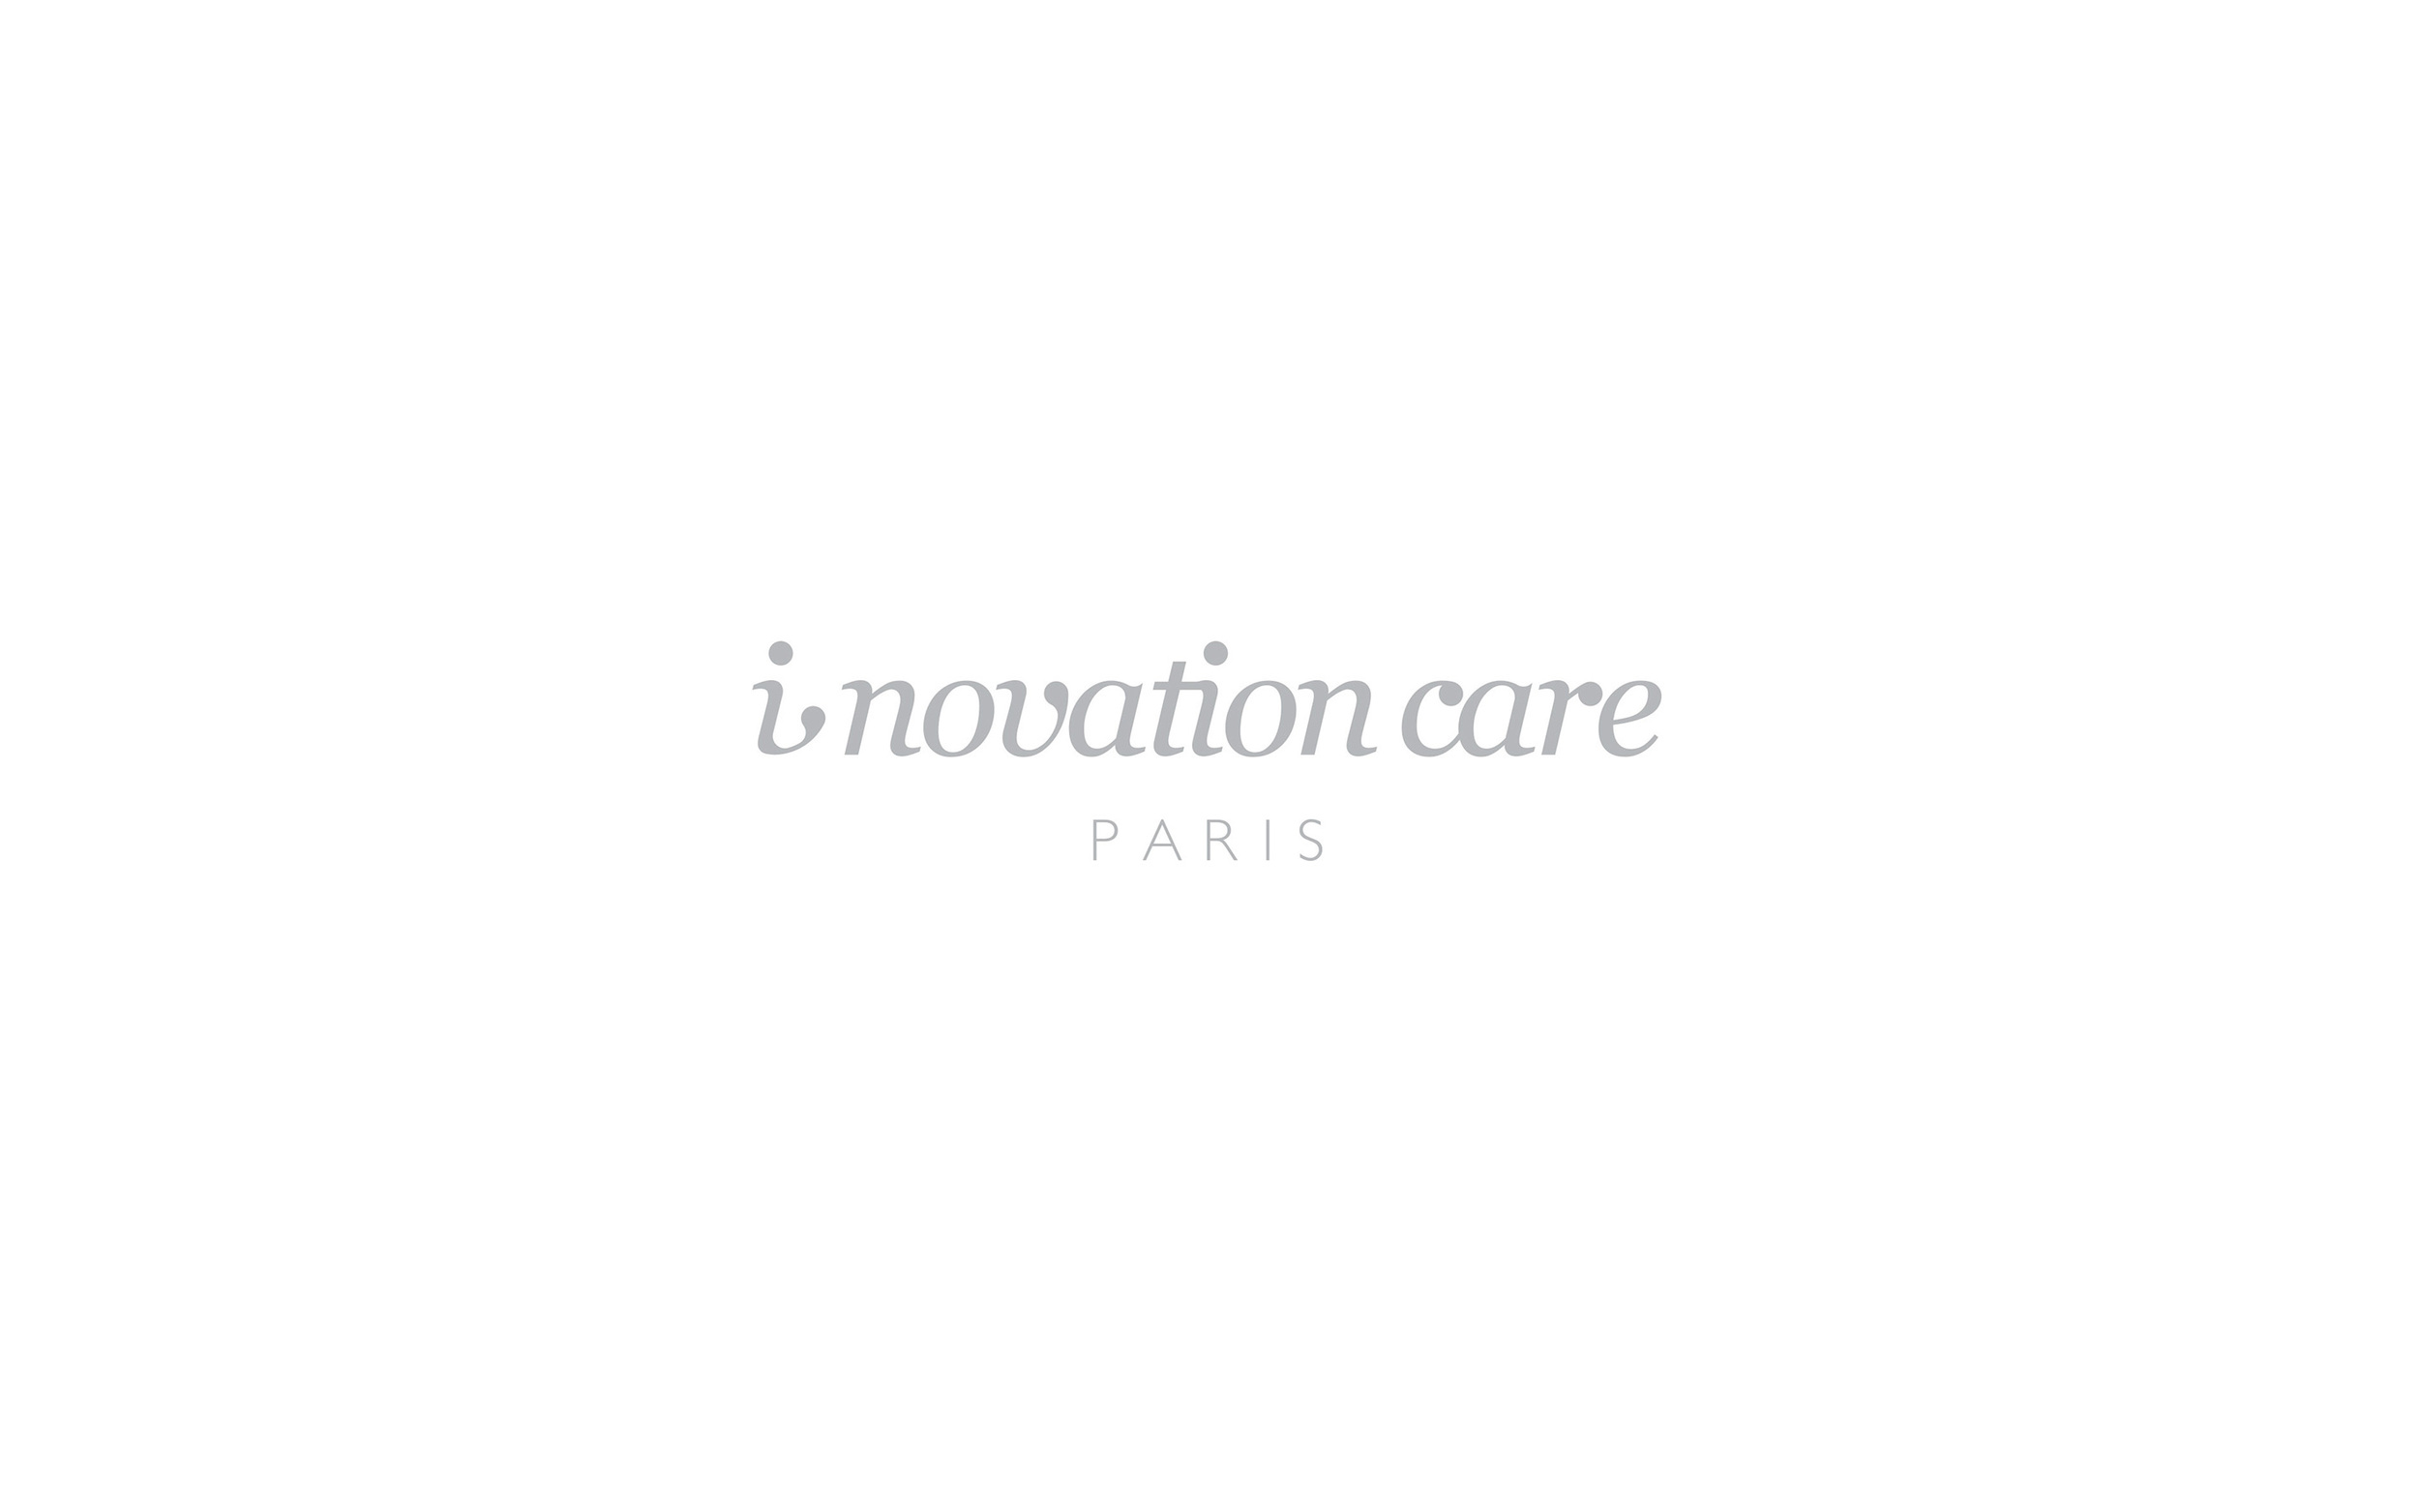 inovationcare-design-childer-01.jpg